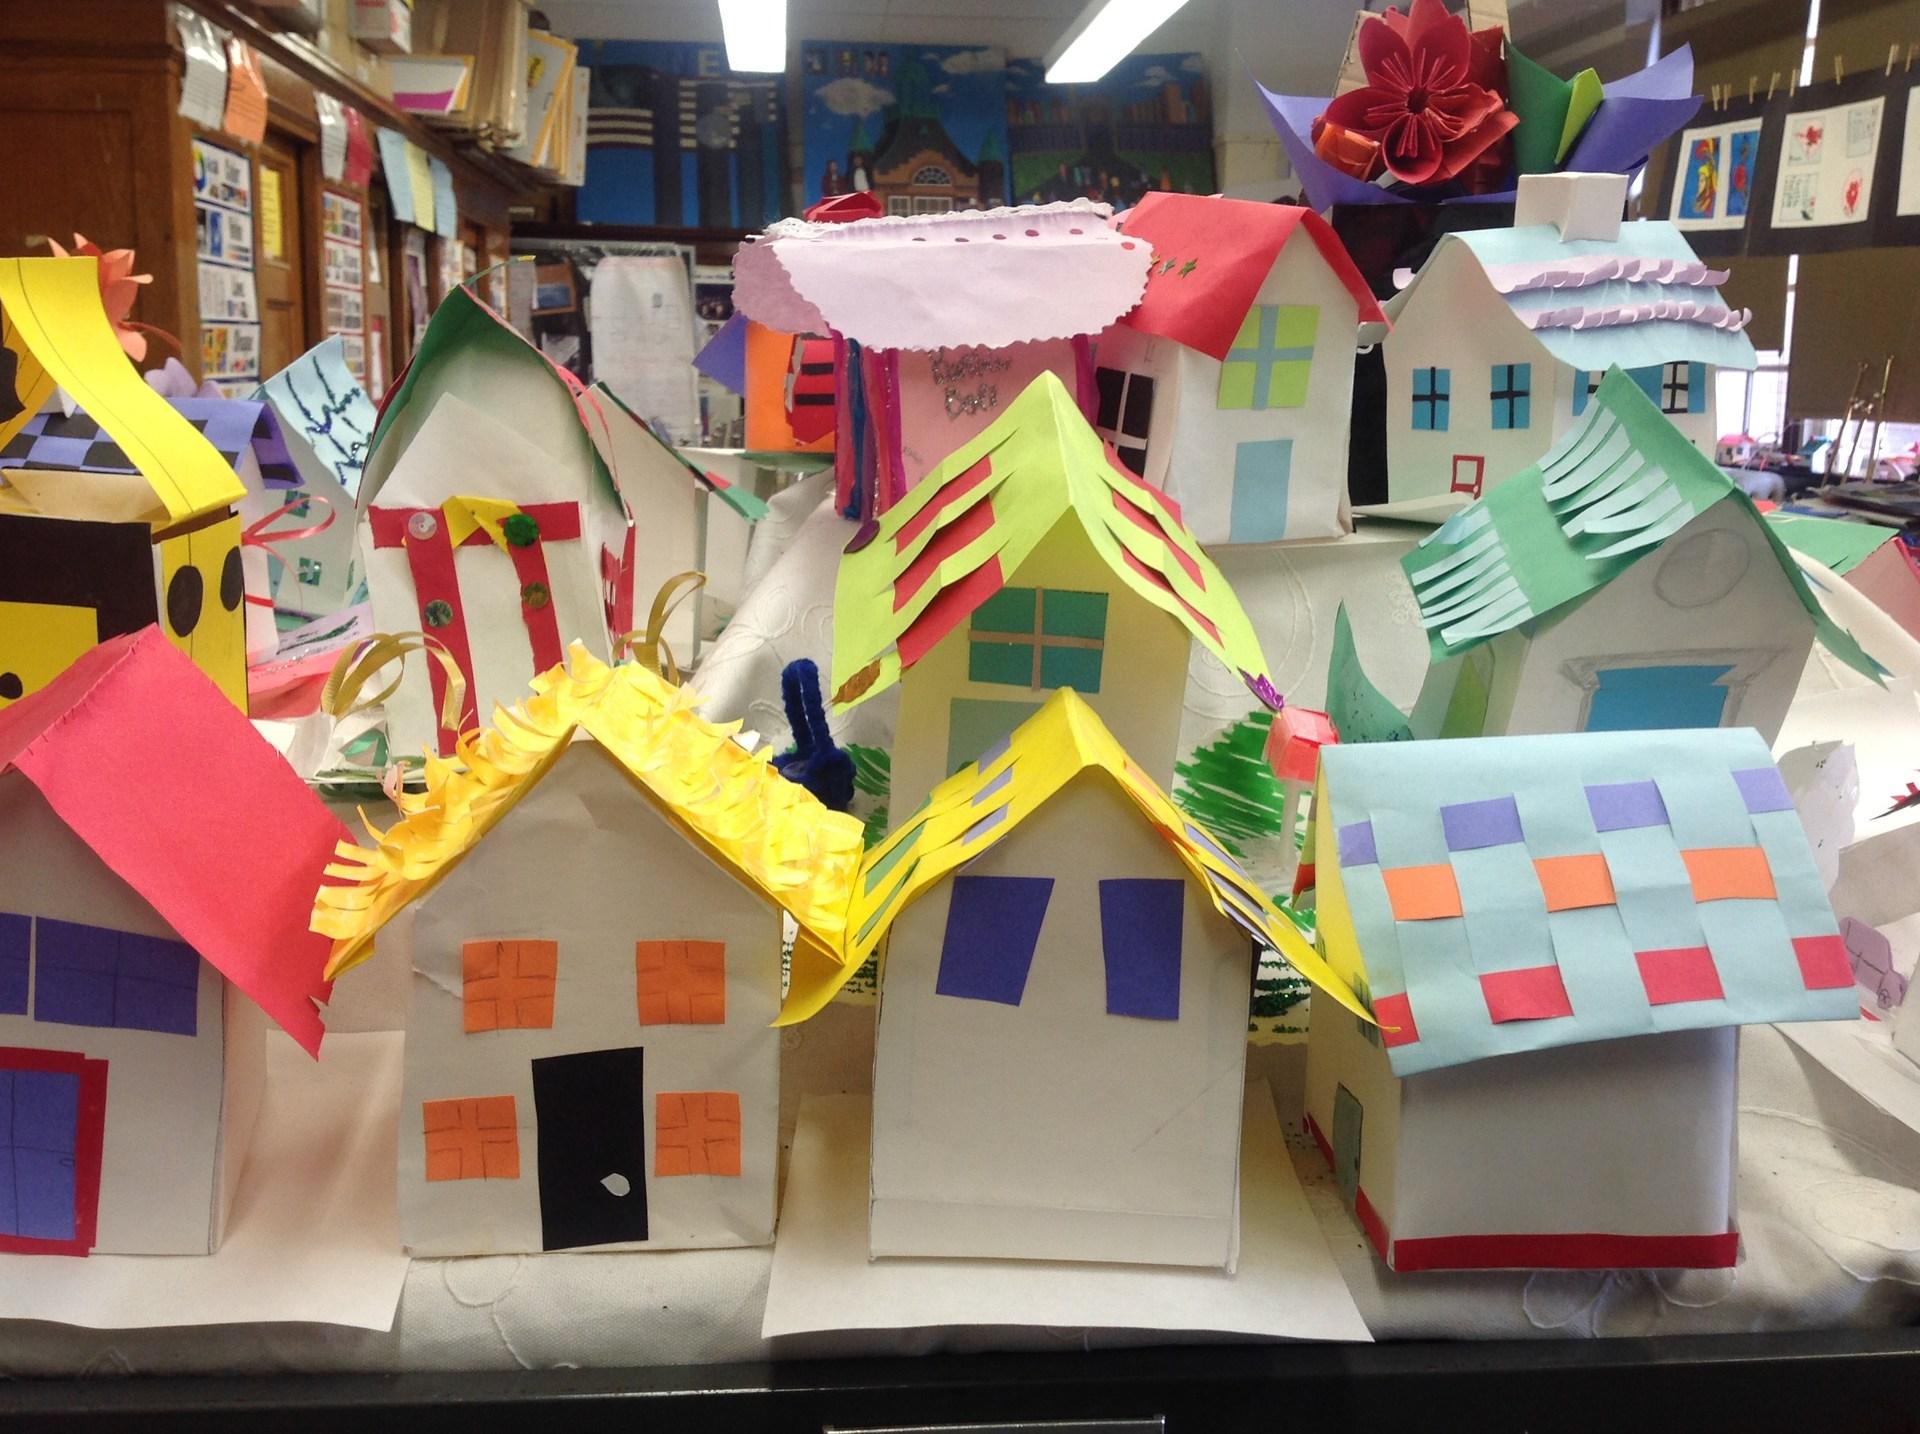 Paper sculpture houses